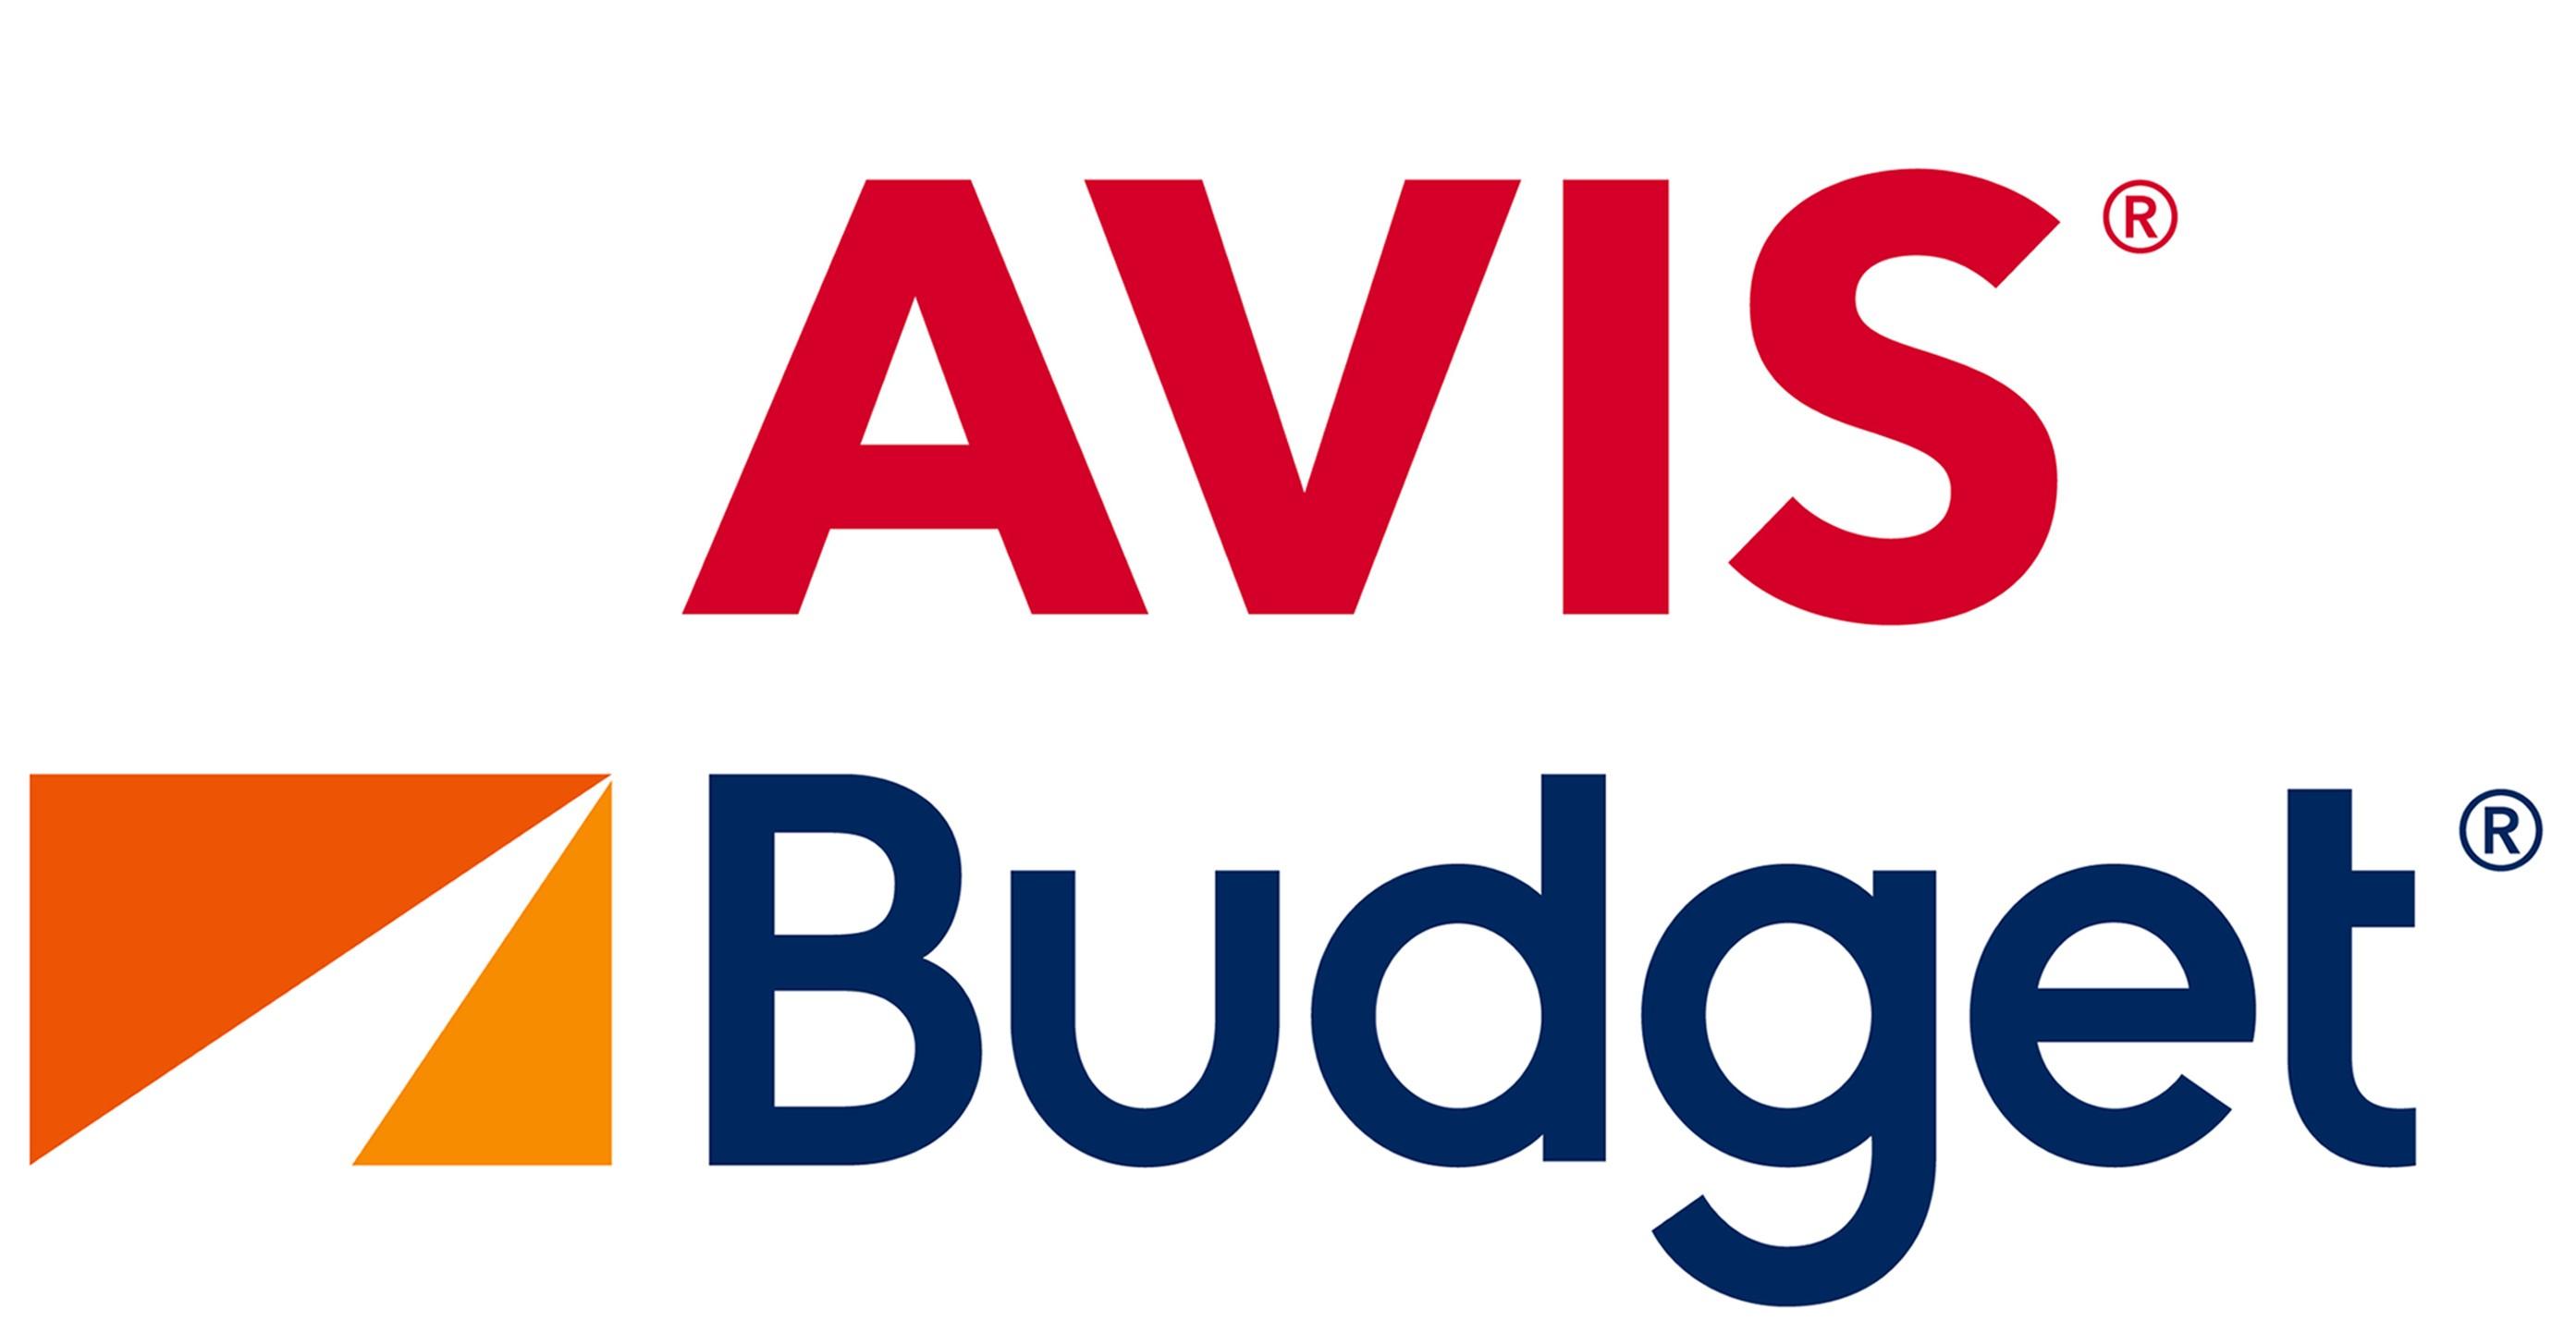 sacl_car_avis_budget_group_joined_logos